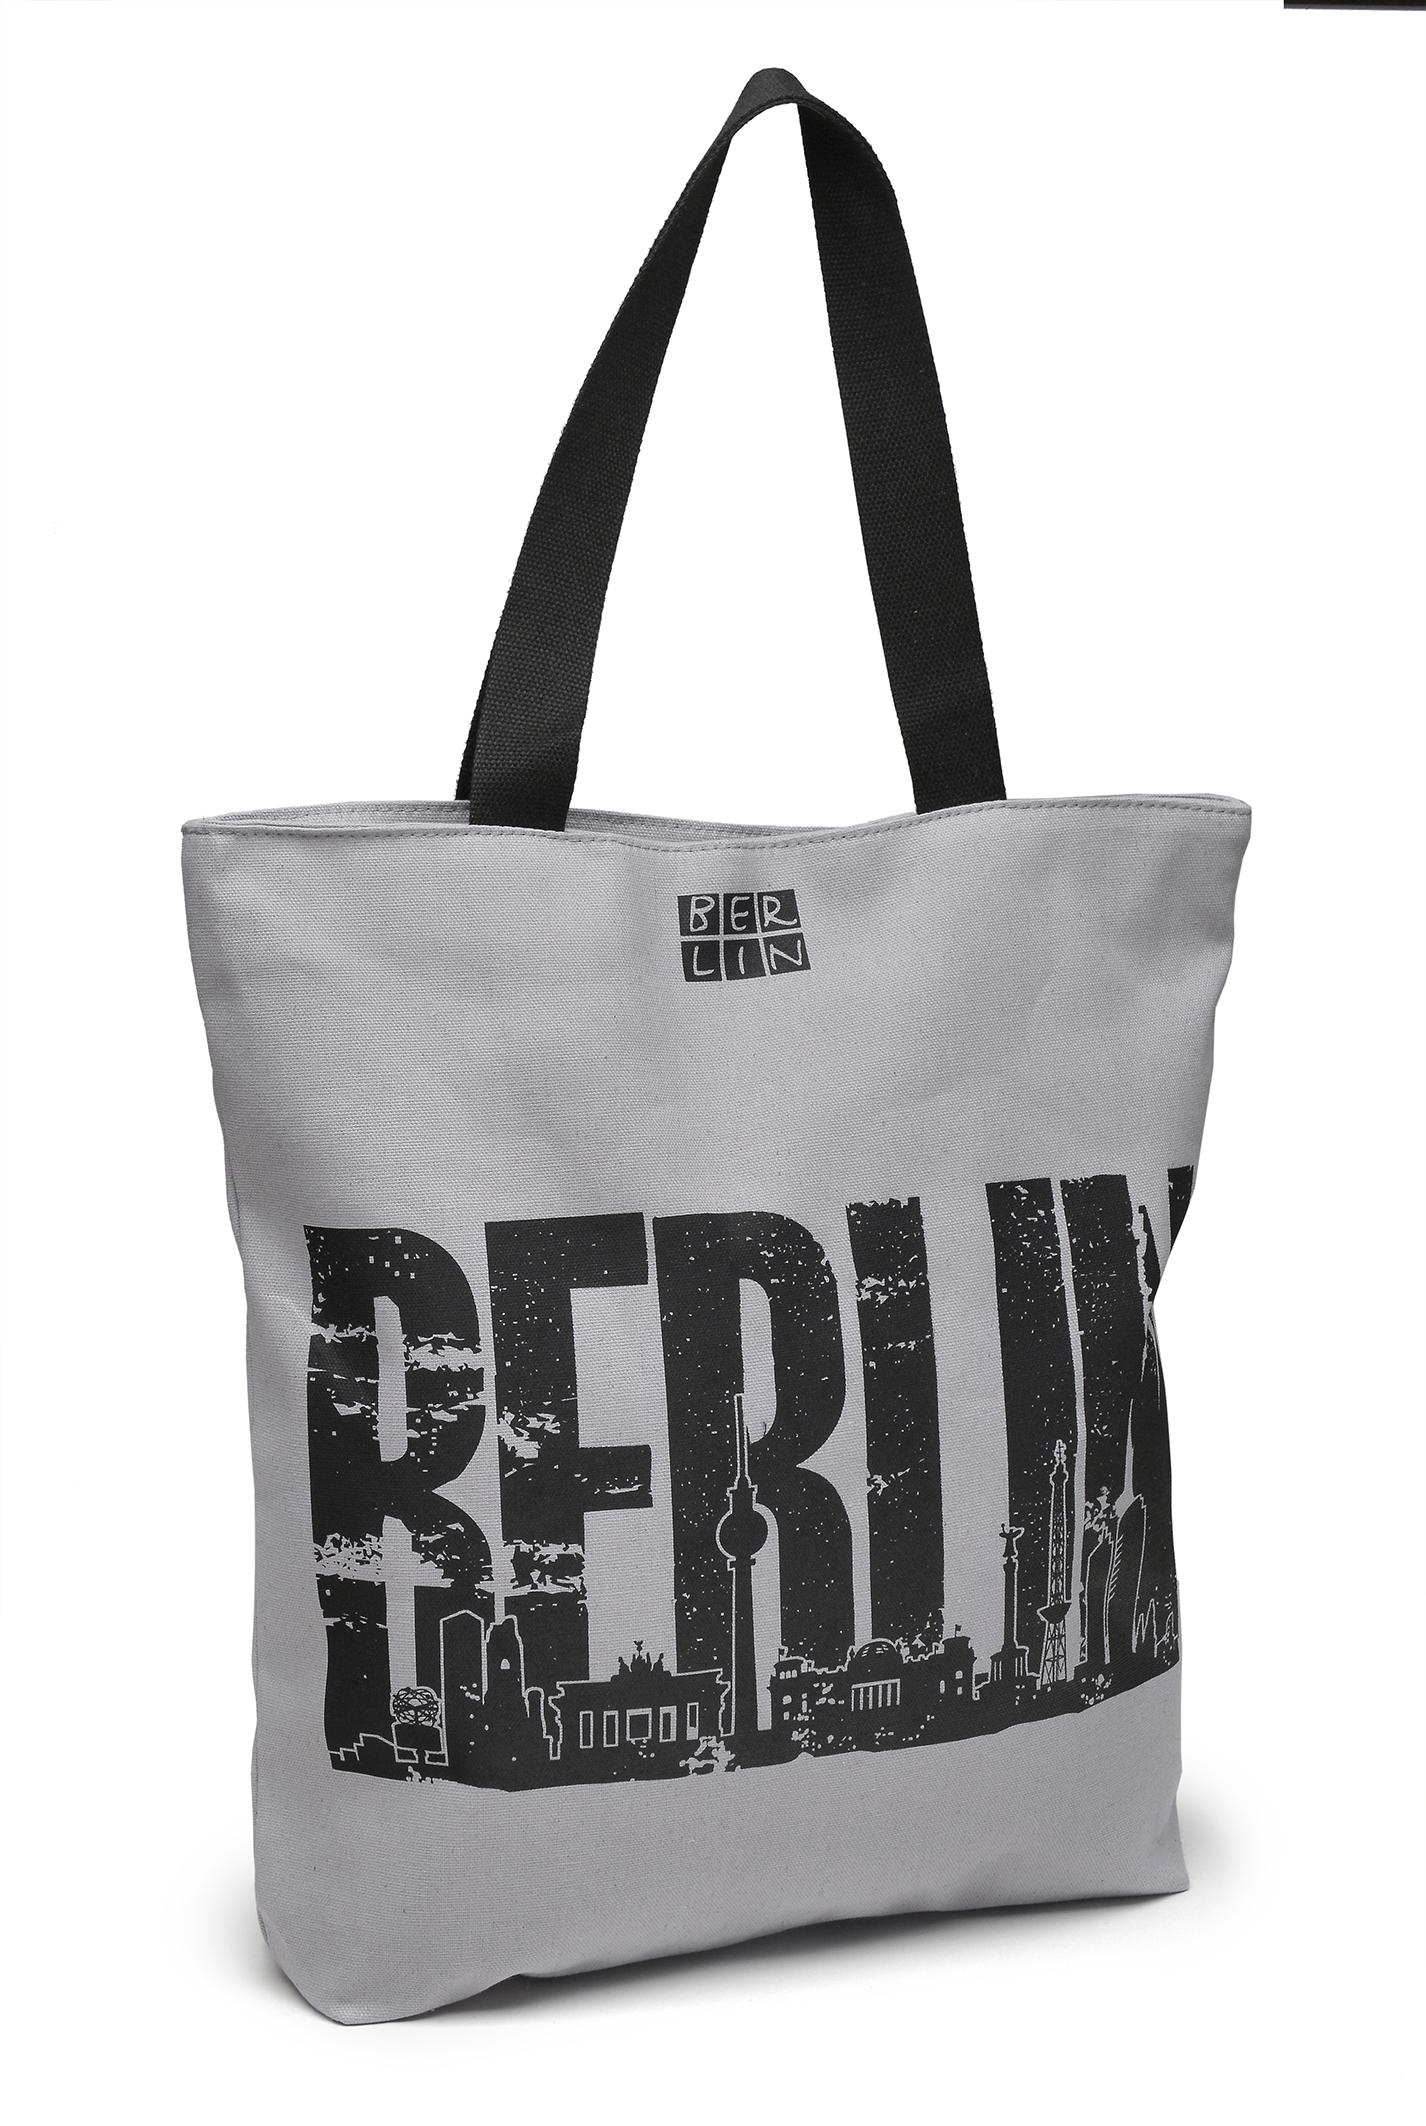 030-2021_Canvas_Shopper_BERLIN_skyline_gr-schwarz